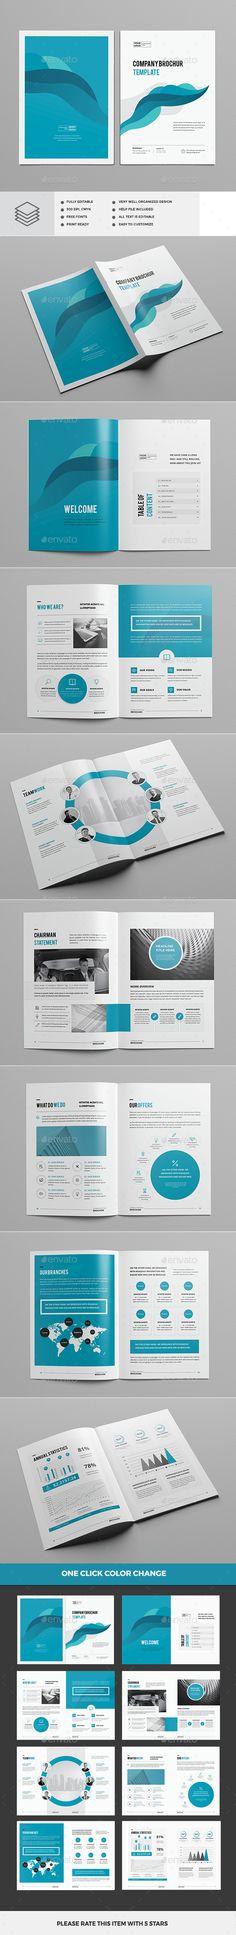 Clean & Modern Multipurpose Brochure — InDesign INDD #brochure #unique • Download ➝ https://graphicriver.net/item/clean-modern-multipurpose-brochure/19411286?ref=pxcr